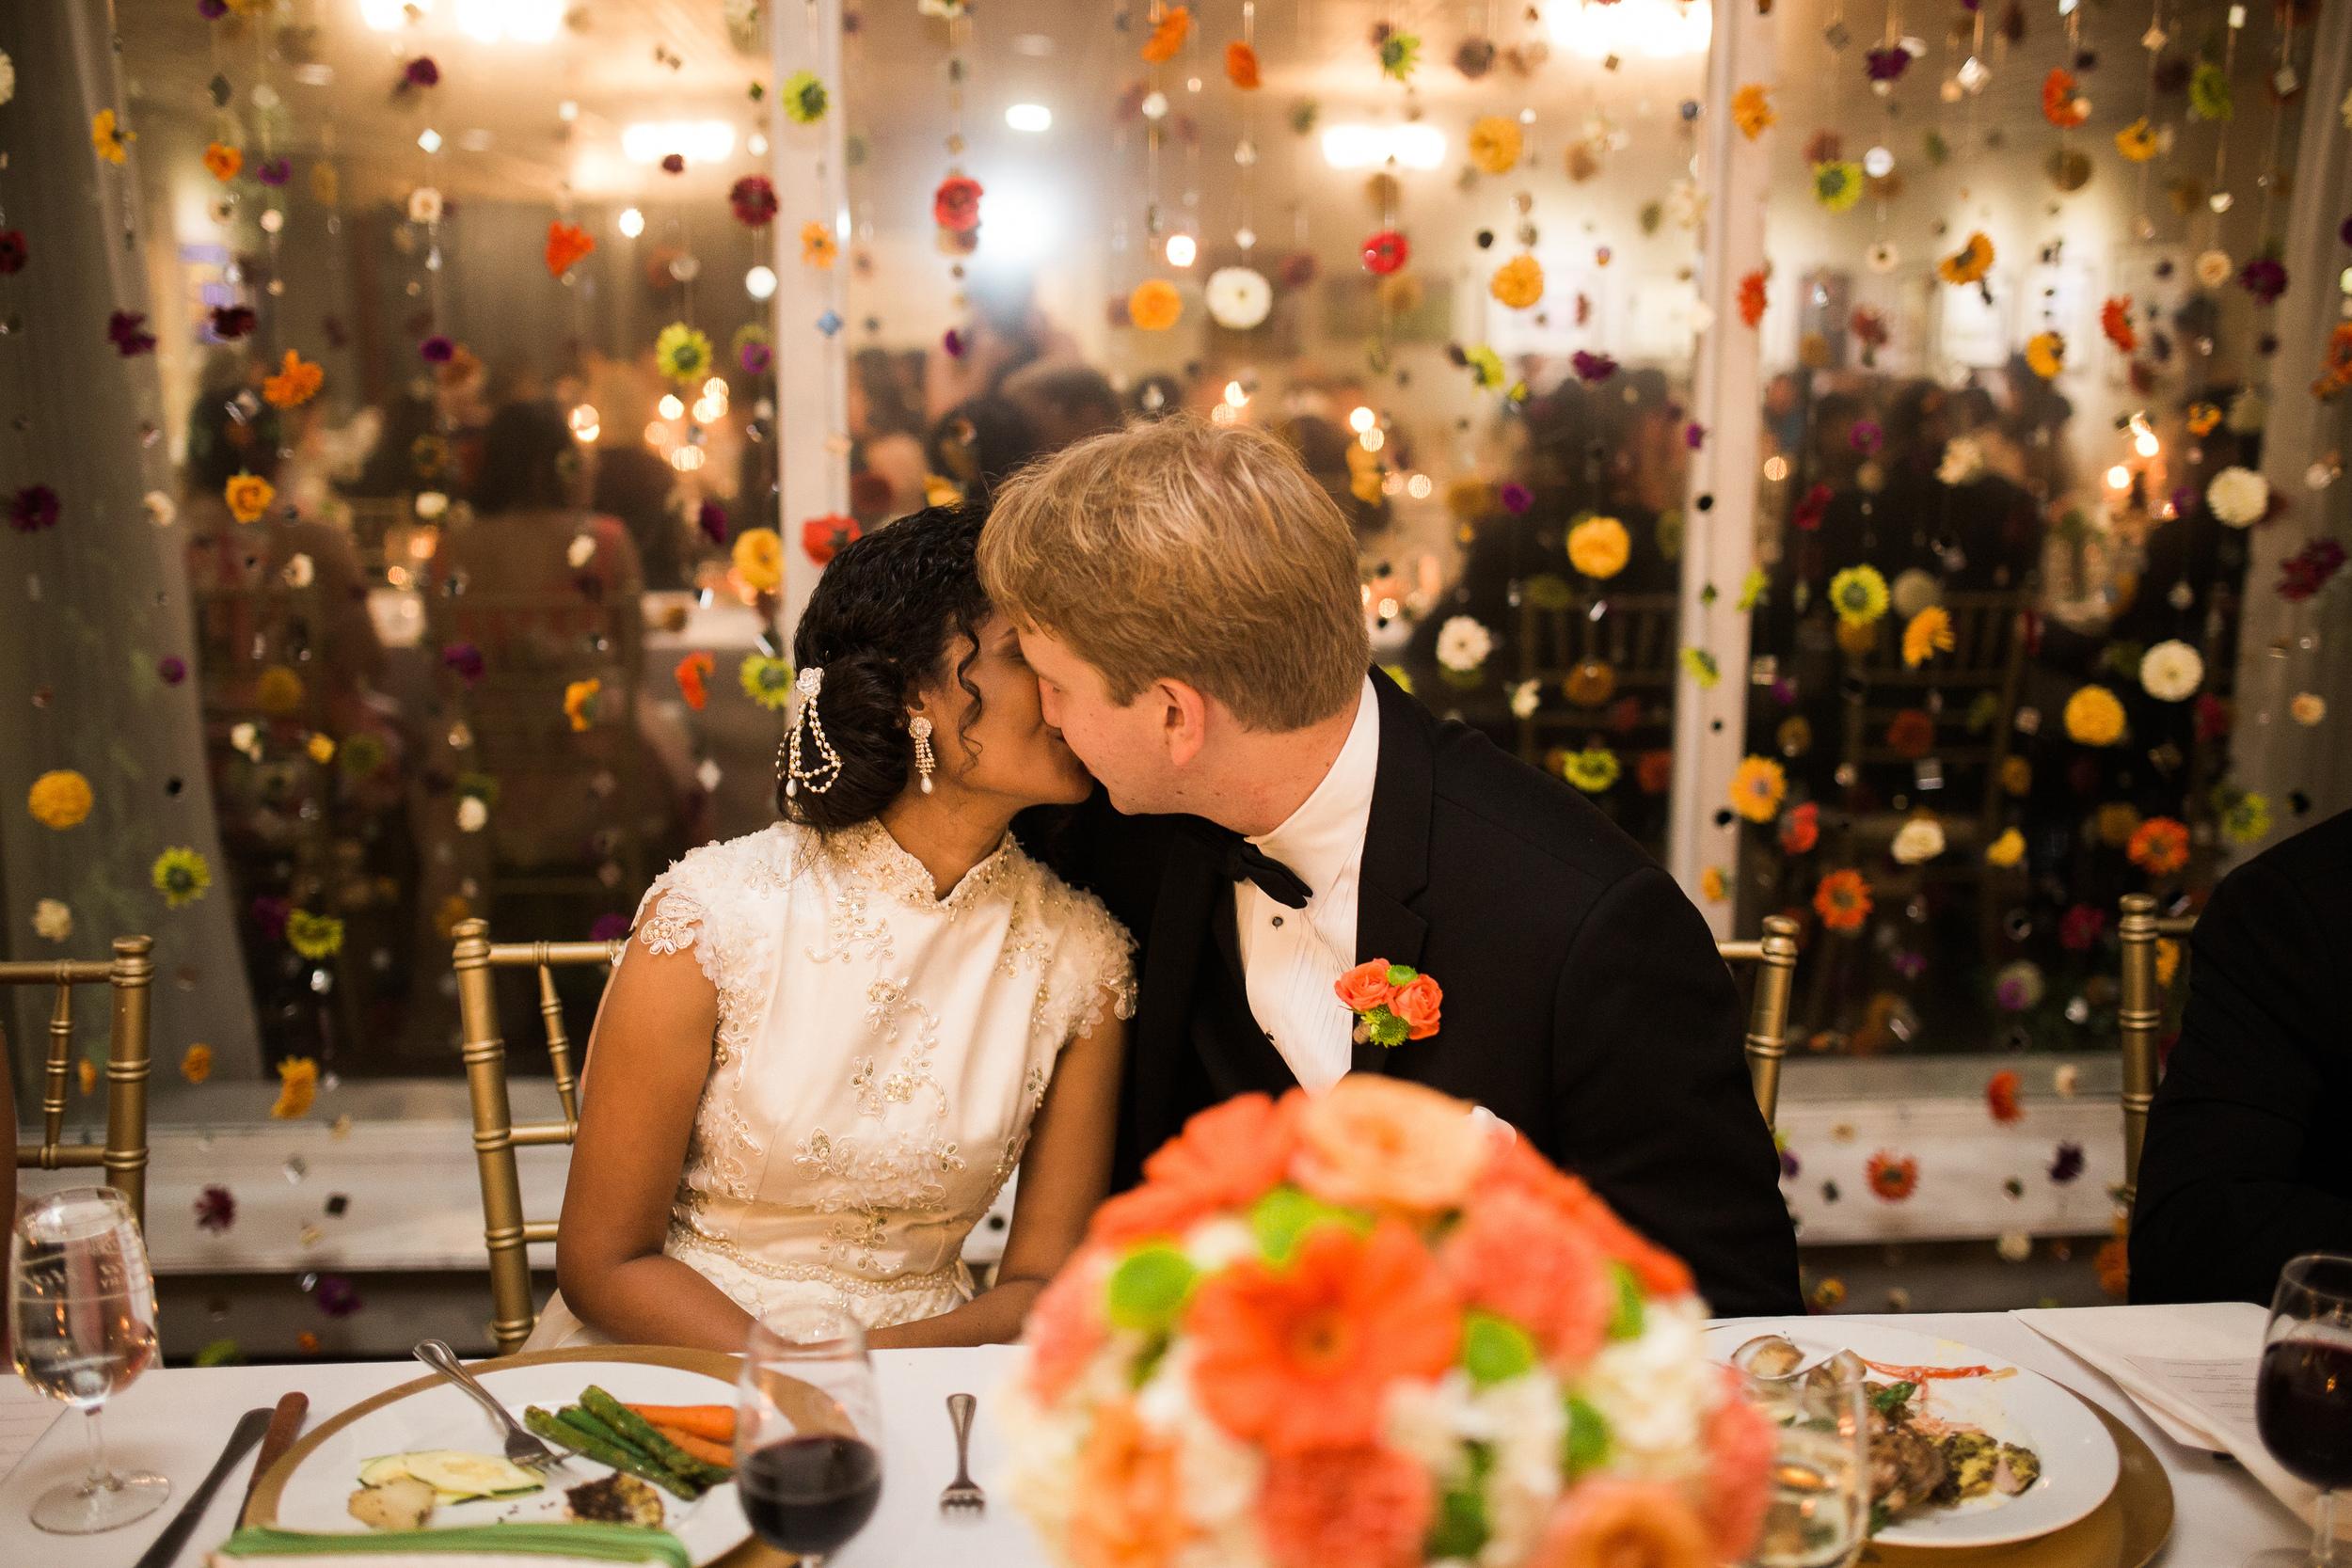 5a3eb-messina-hof-wedding-53messina-hof-wedding-53.jpg